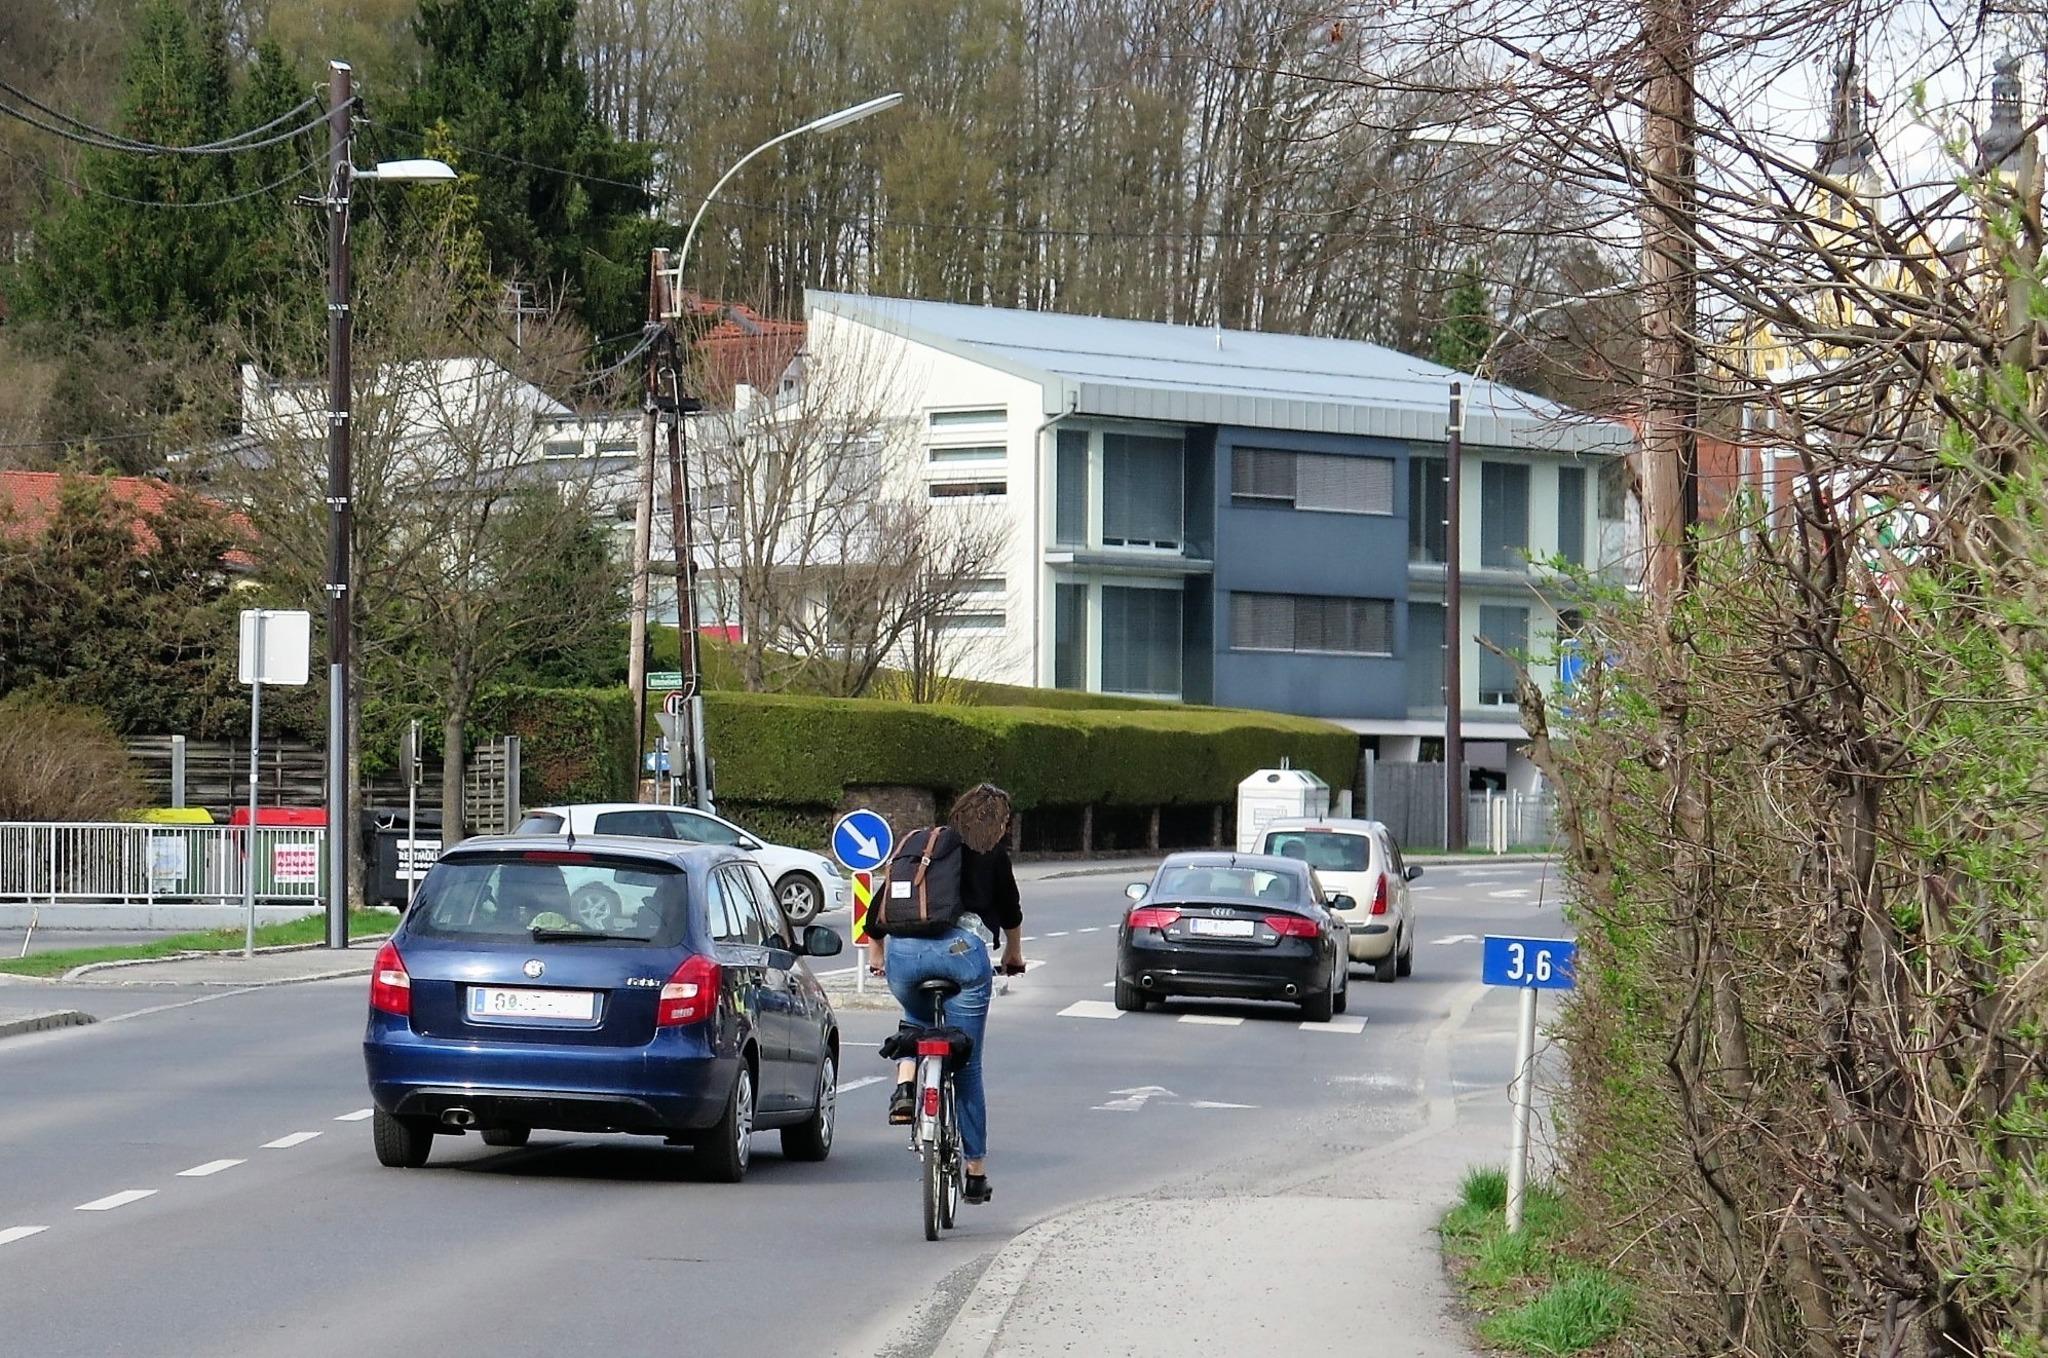 Janischhofweg, 8043 Graz autogenitrening.com Mariatrost - IMMMO